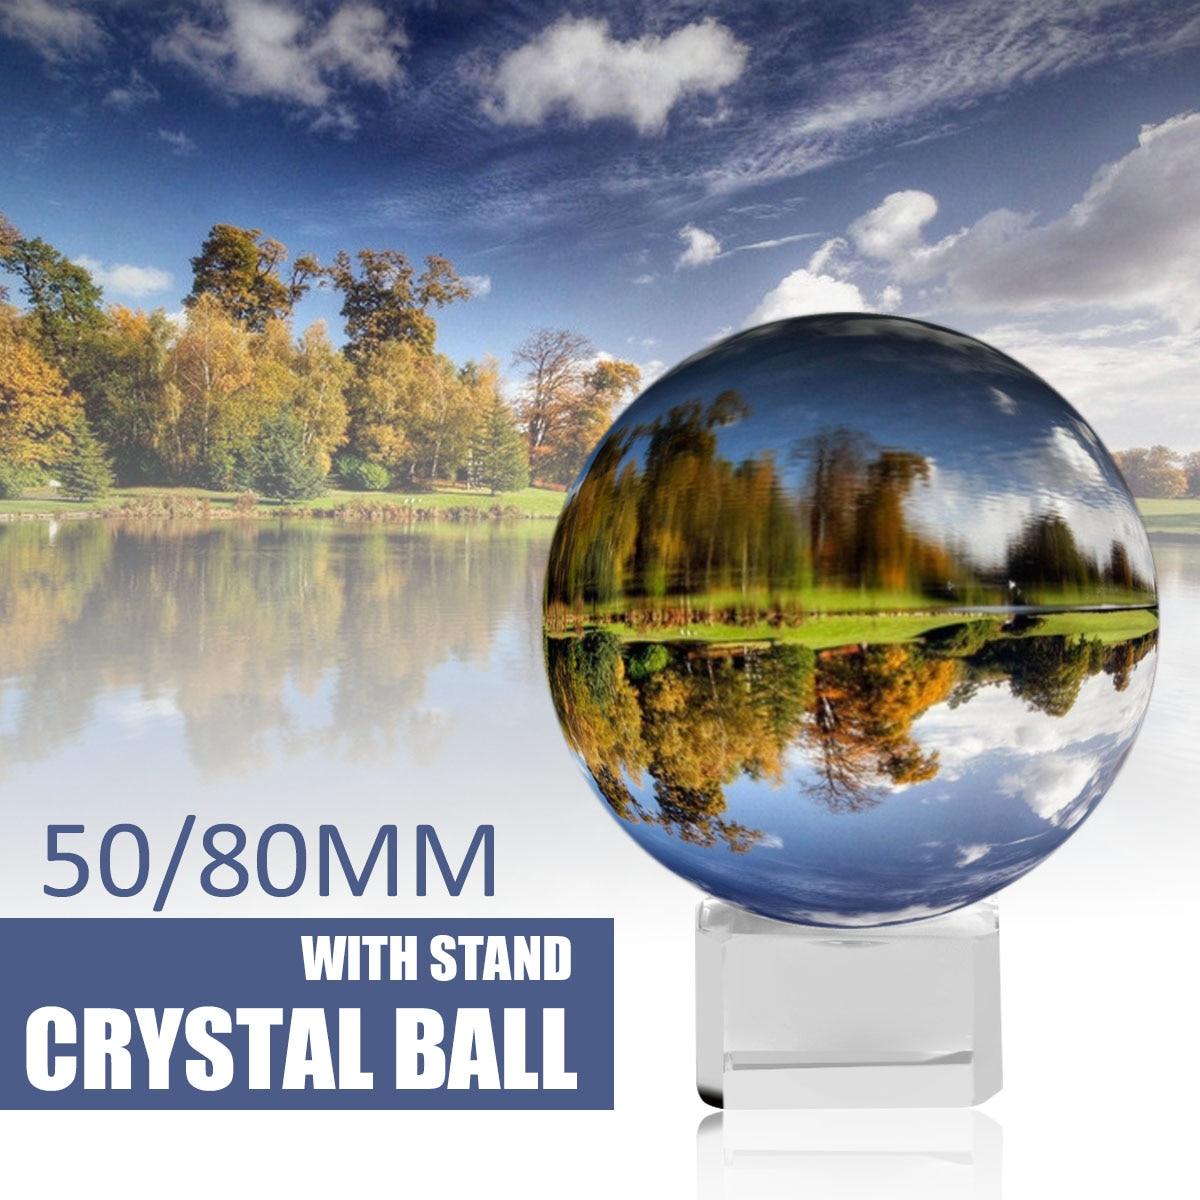 Kristall Ball Kugel 50mm 80mm mit Stand 2 Fotografie Lensball Hintergrund Decor K9 Glas Kristall Klar Objektiv Ball